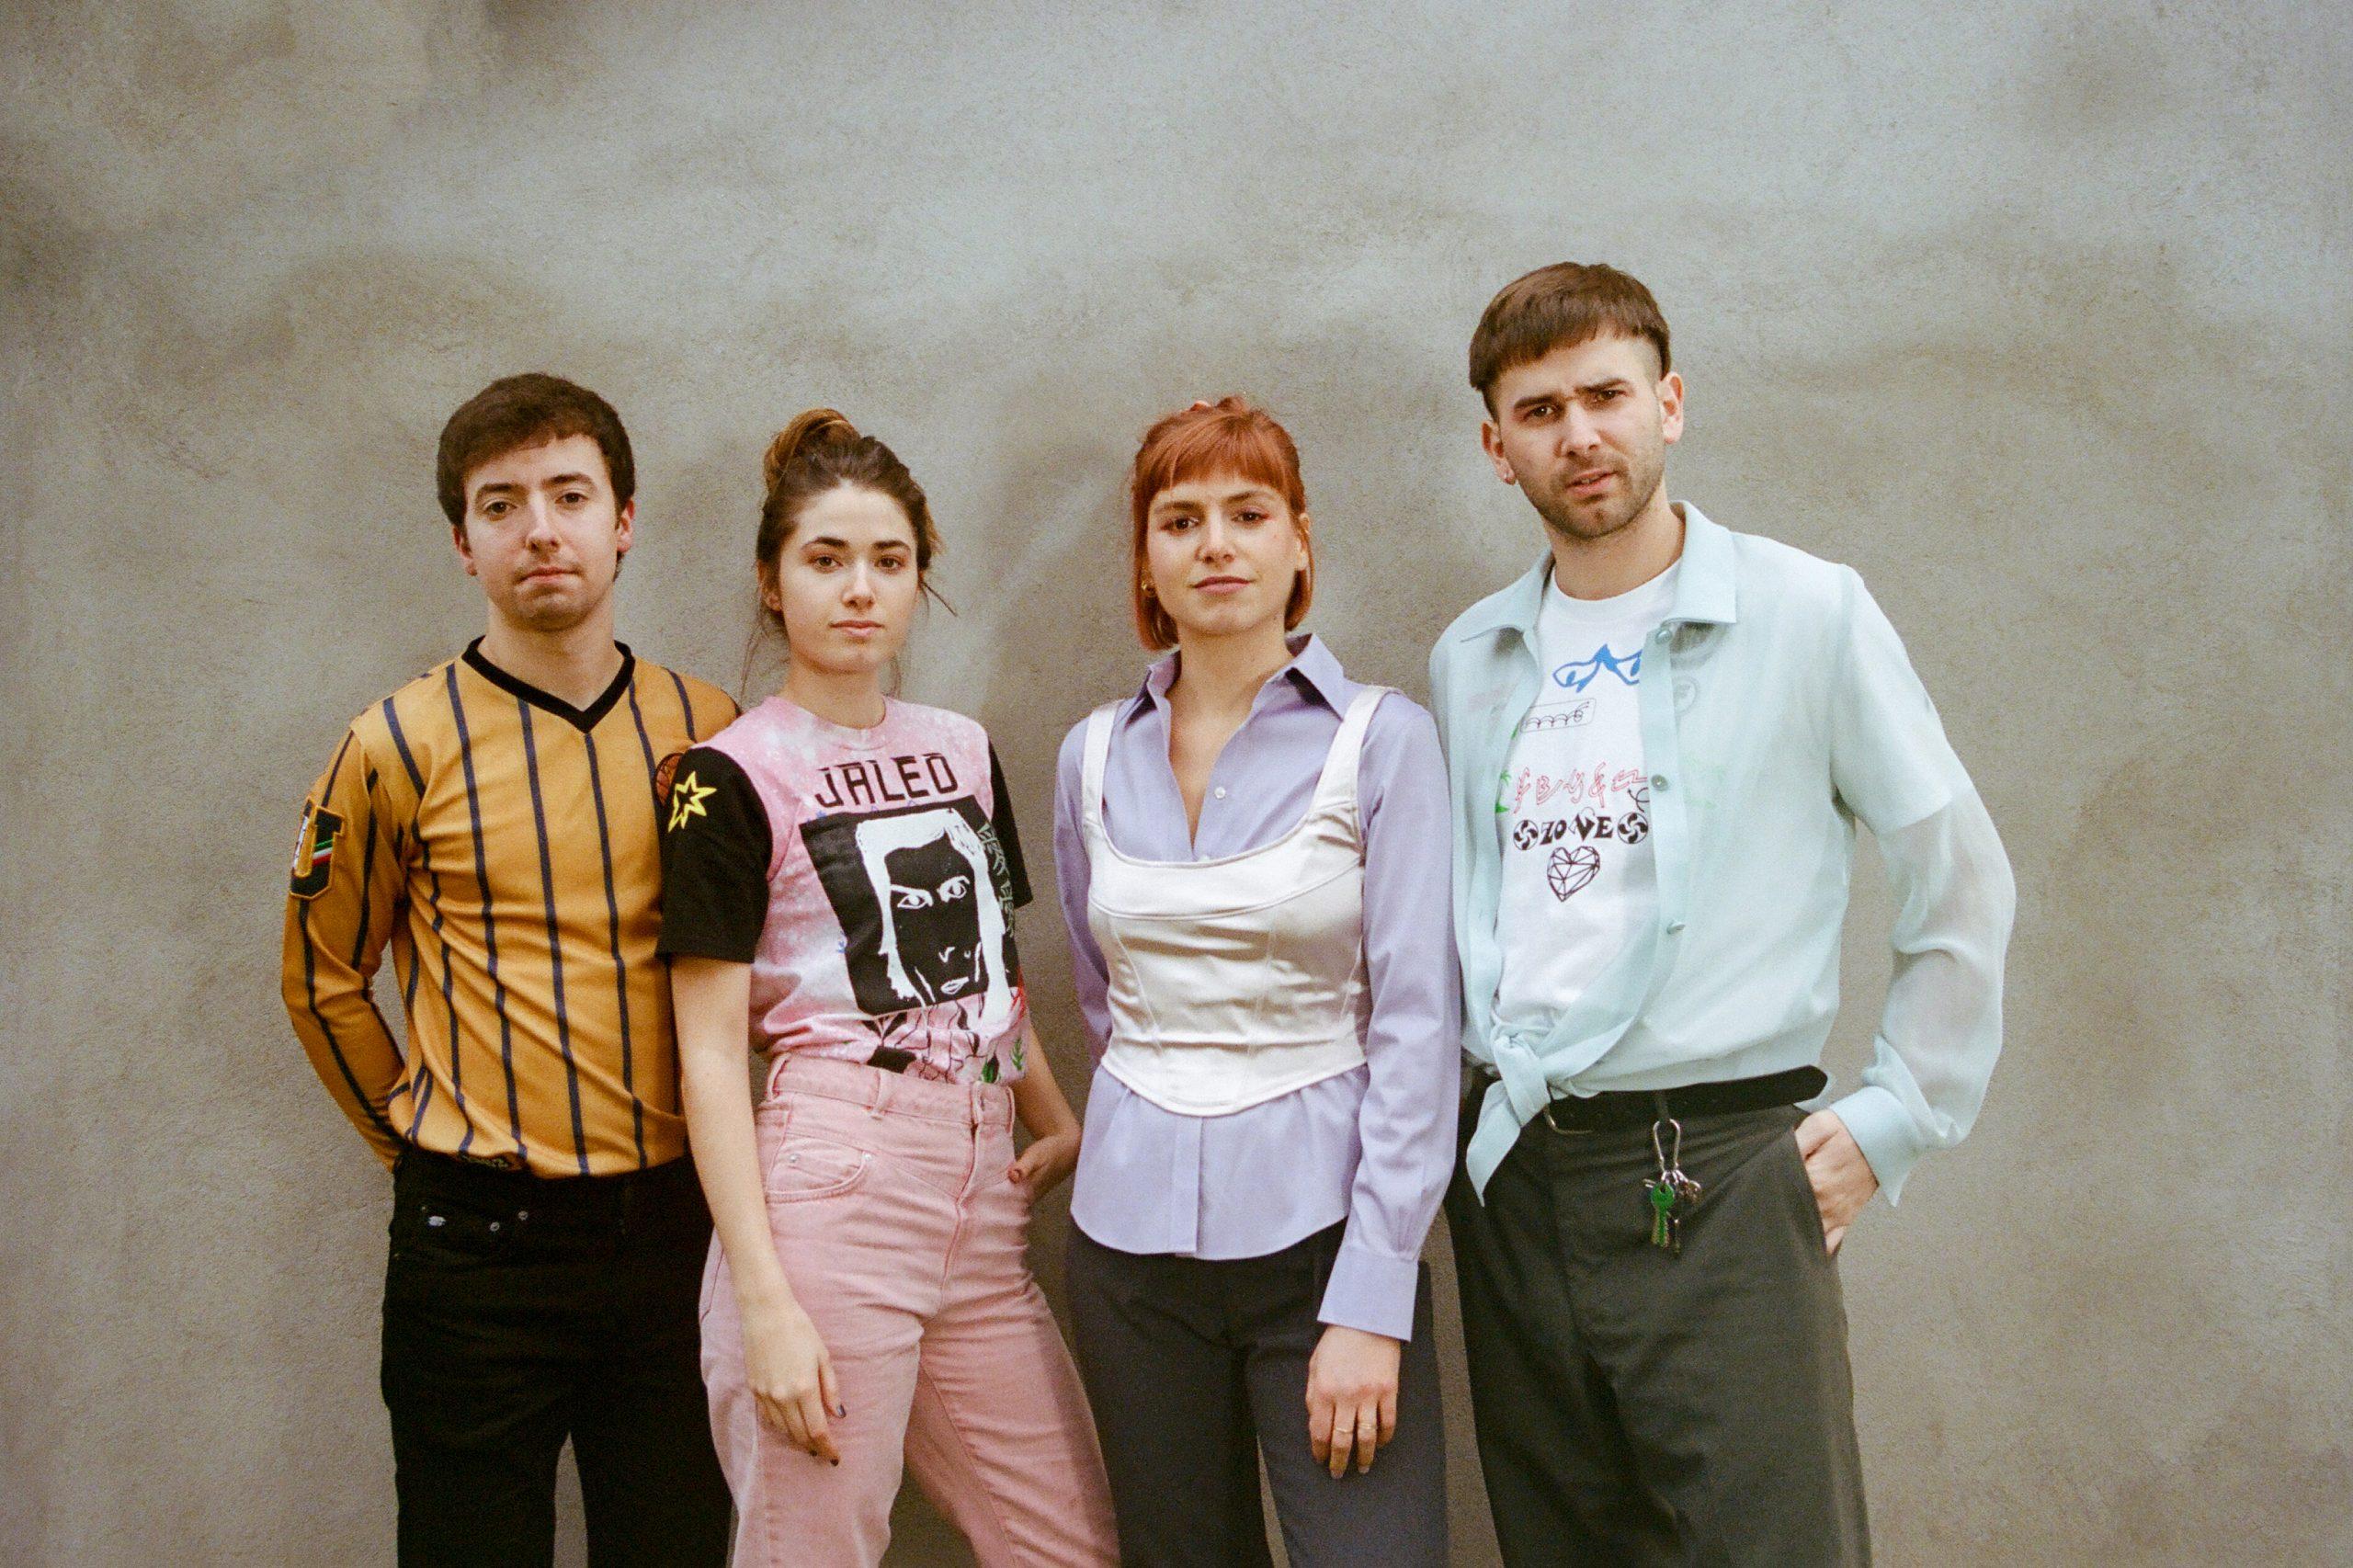 Belako presenta su nuevo álbum en primicia en Euskalduna